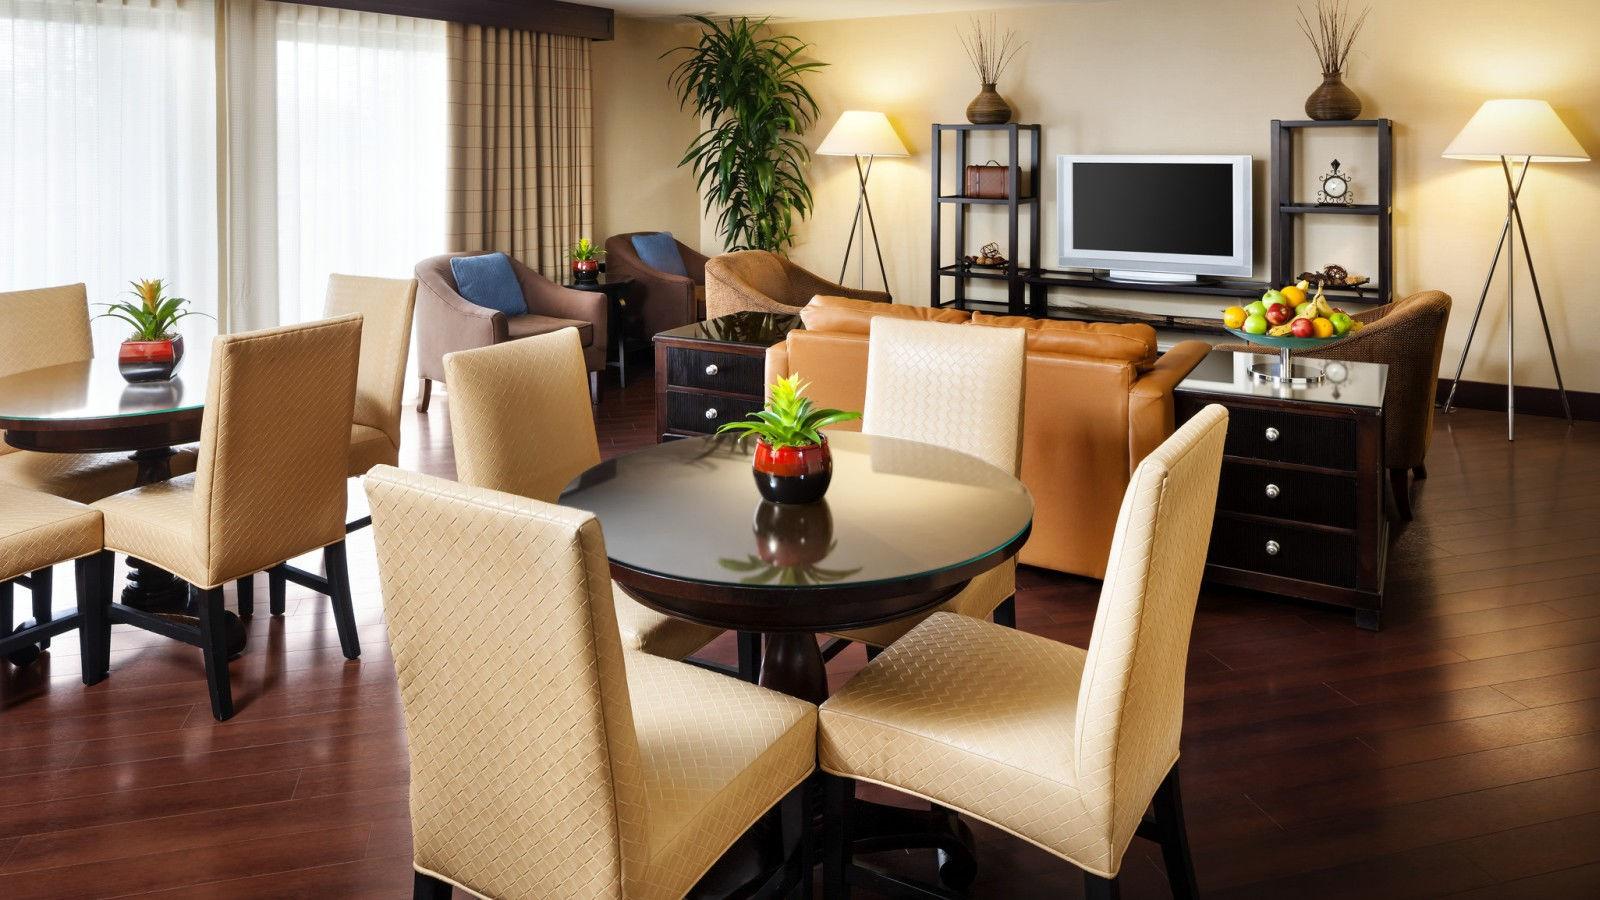 Crescent Hotels Amp Resorts To Manage Sheraton Milwaukee